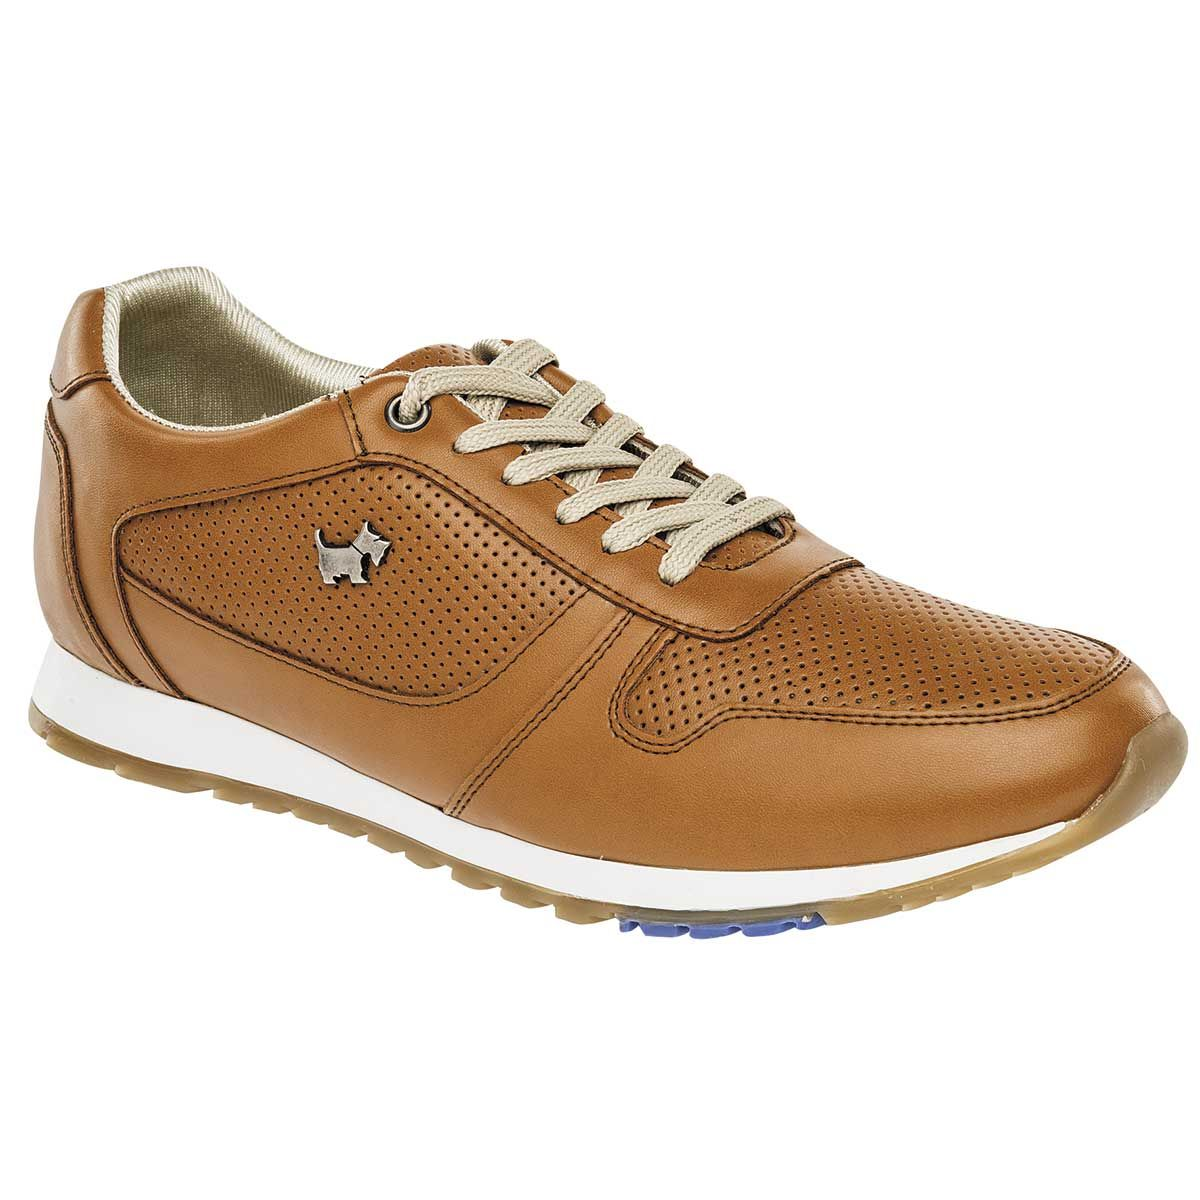 7c4faf9f Pakar Urbano Ferrioni H6002ML camel Zapatos Casuales, Zapatos Nuevos,  Modelos De Zapatos